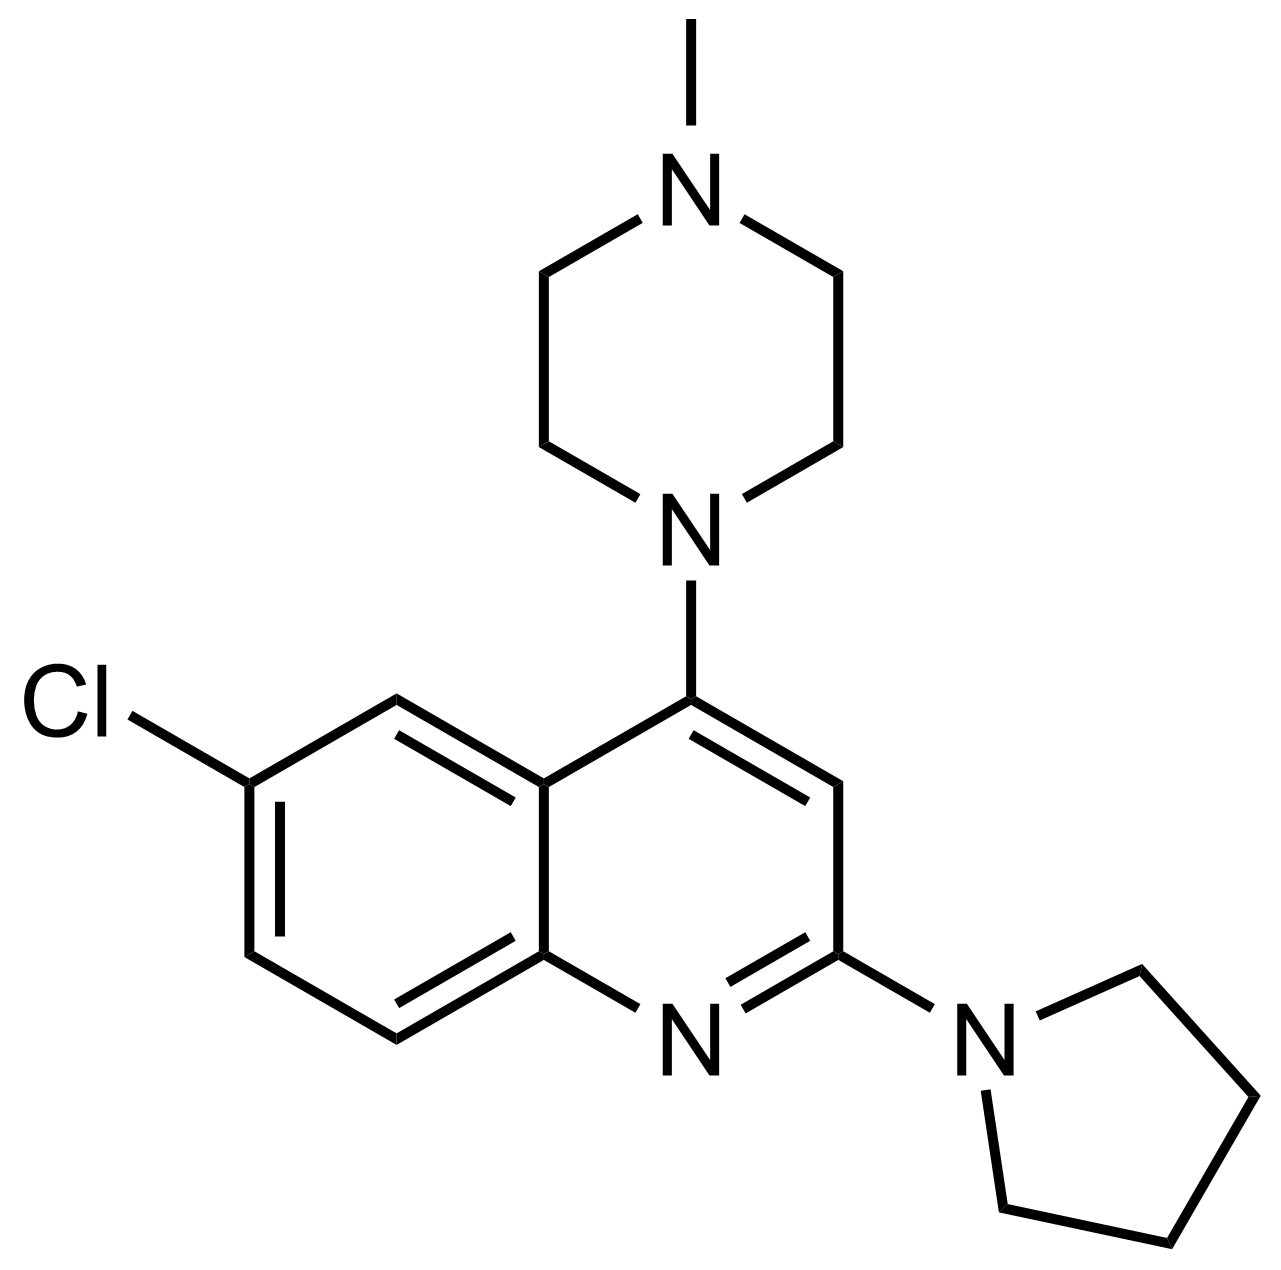 Structure of 6-Chloro-4-(4-methylpiperazin-1-yl)-2-(pyrrolidin-1-yl)quinoline